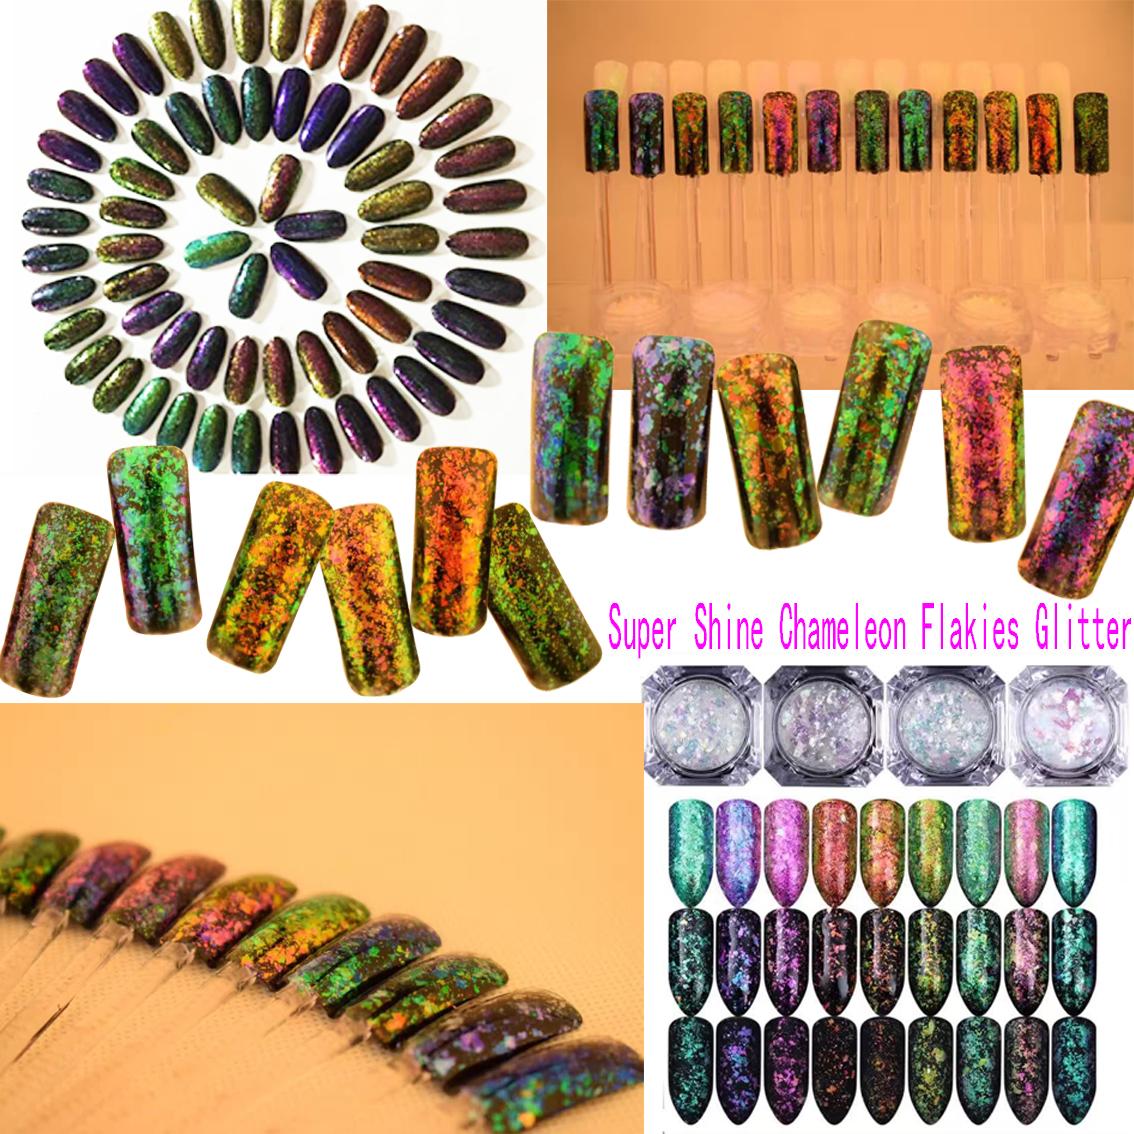 2017 Newly Nail Irregular Colorful Chameleon Flakes Glitter